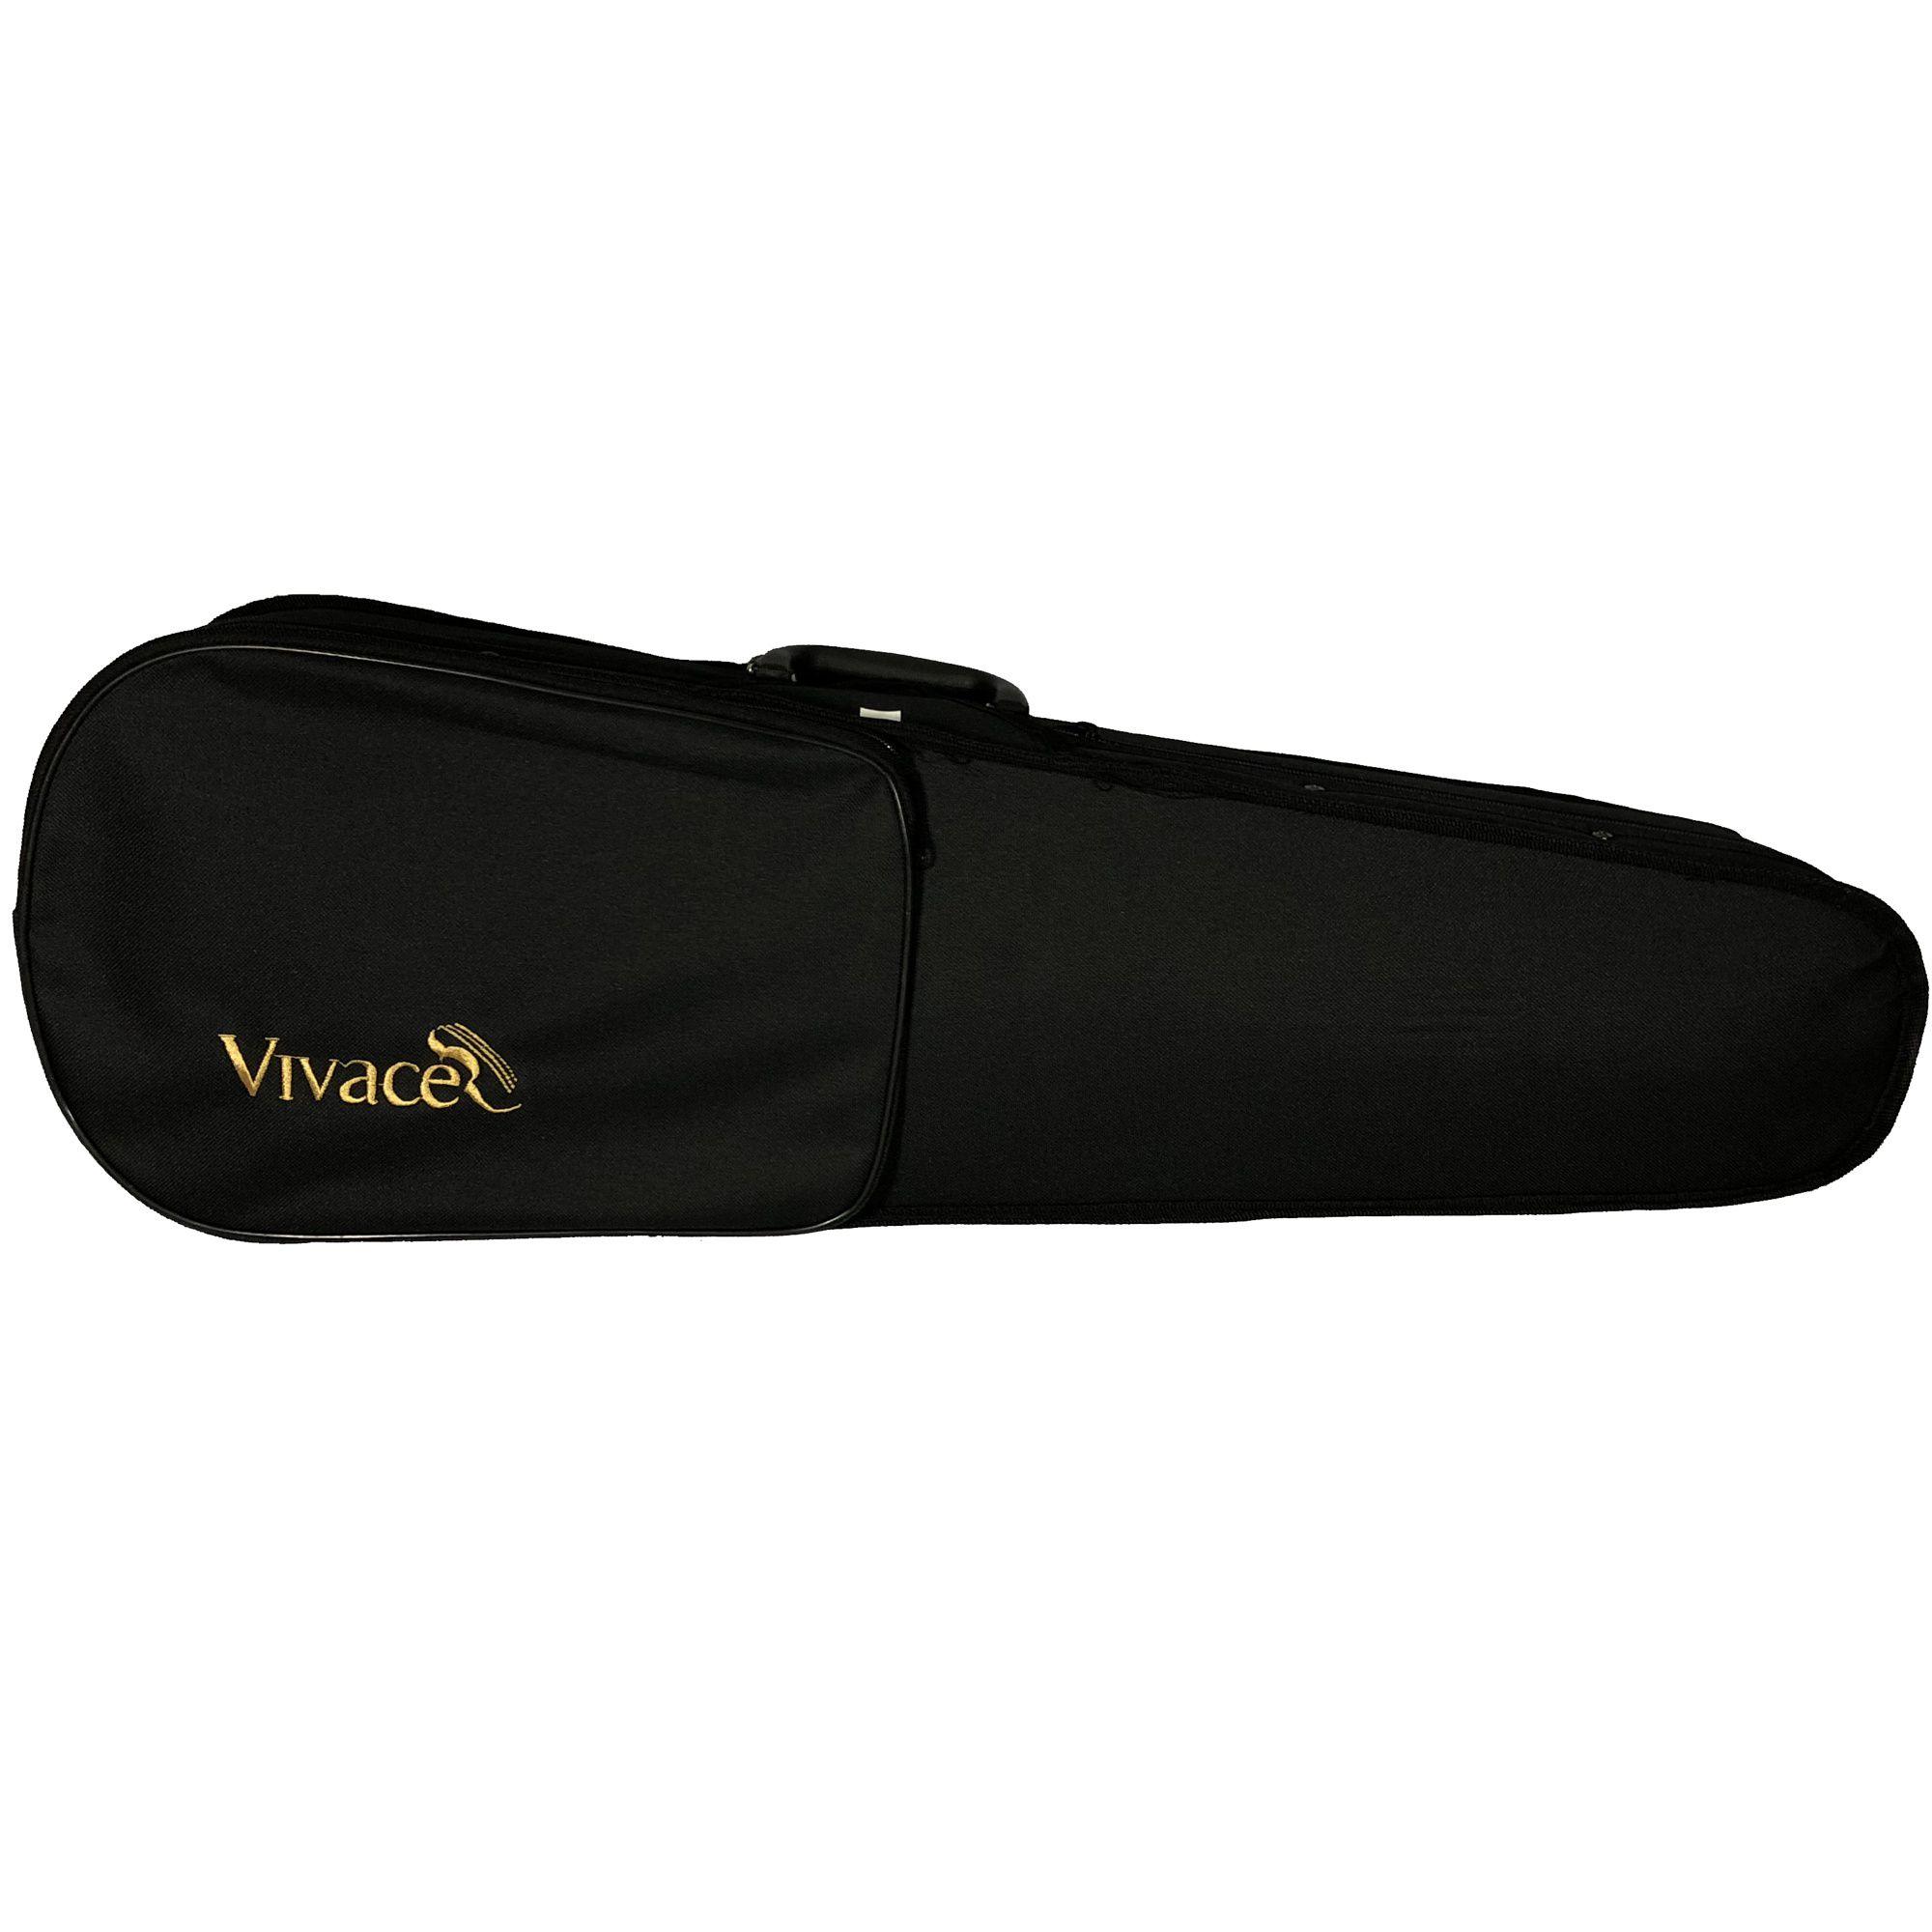 Kit Violino Vivace Mozart 4/4 Case + Pedestal + Espaleira